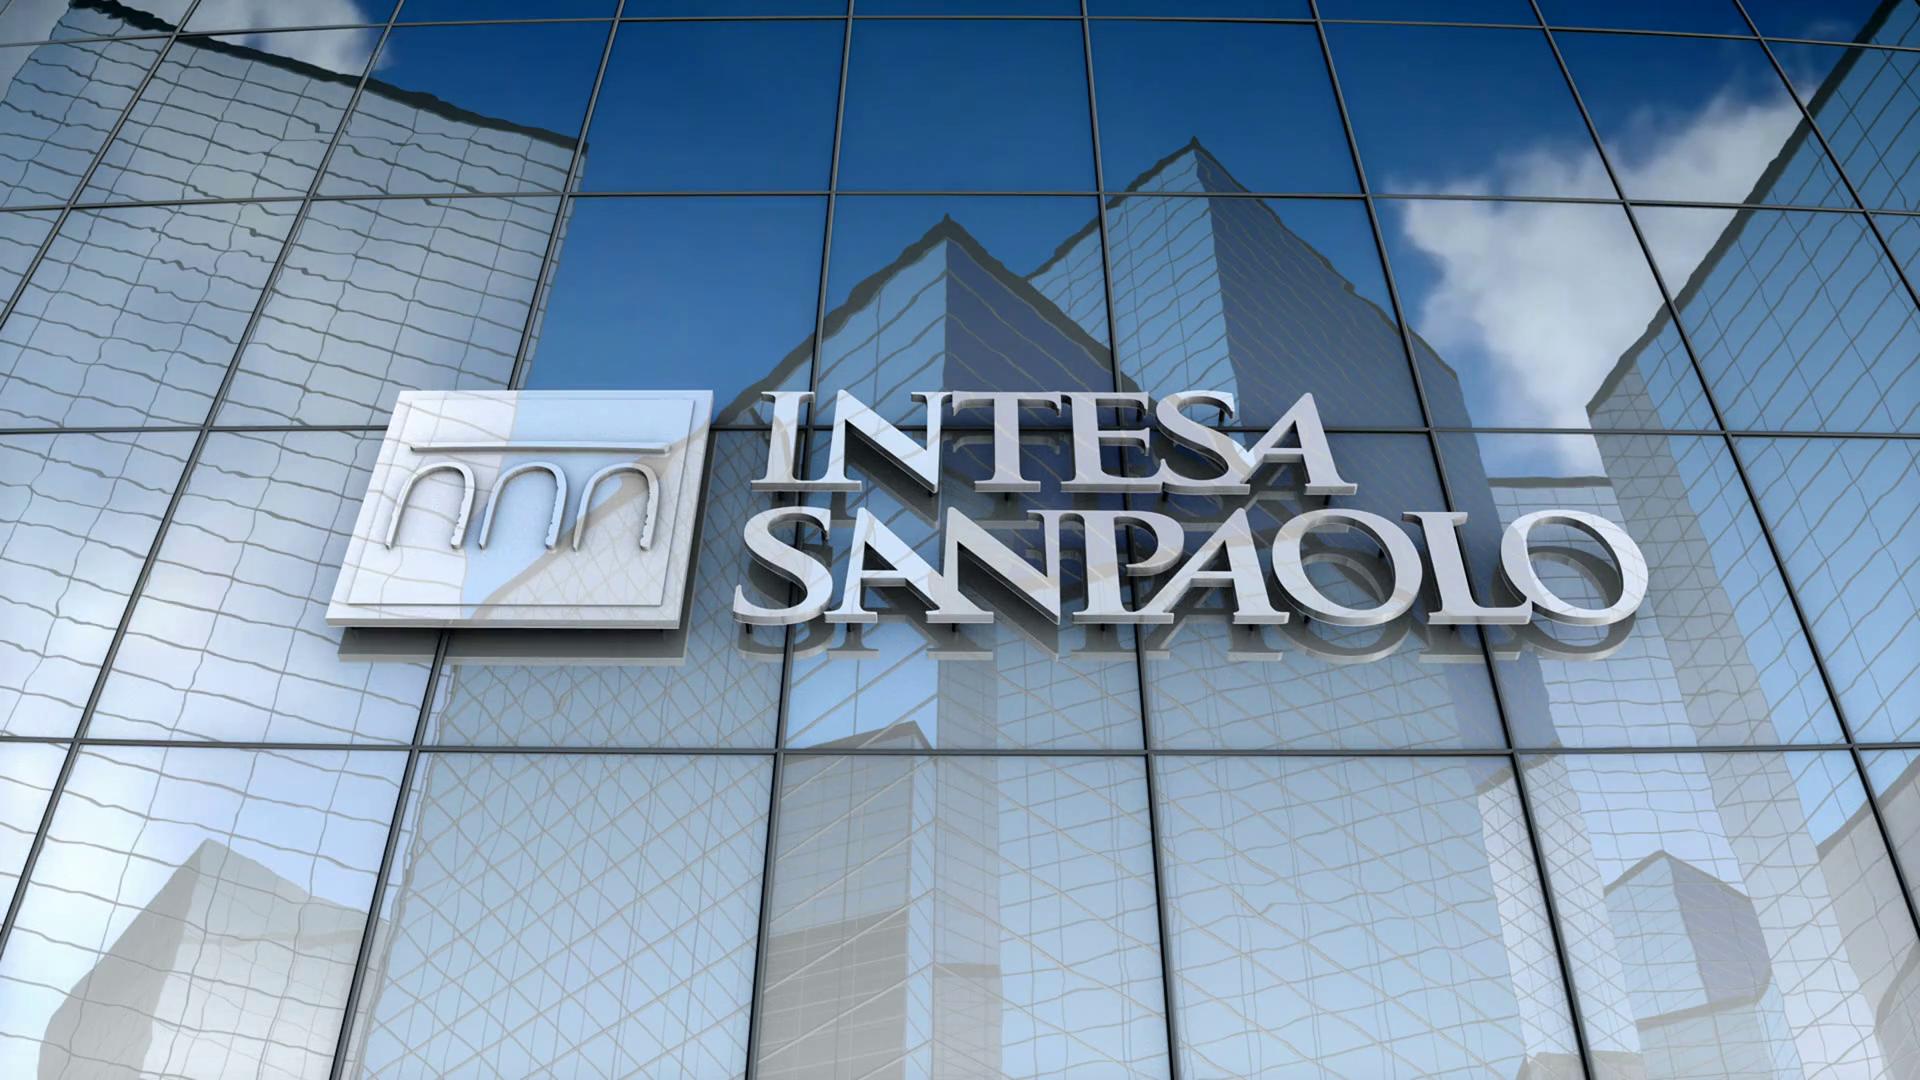 images-intesa-sanpaolo